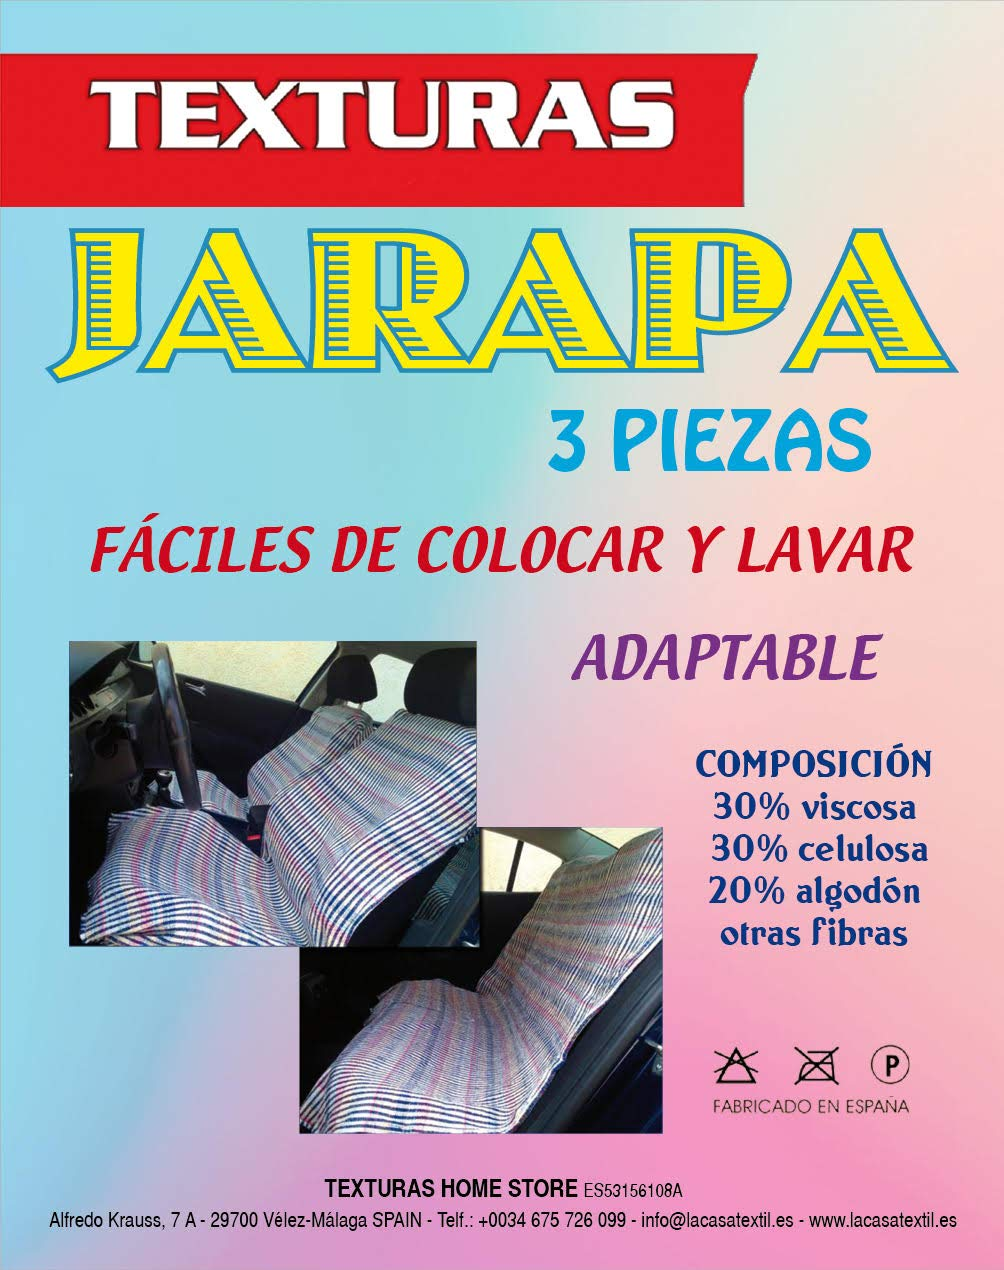 TEXTURAS HOME Set Harapas 3 Piezas Classic AUTOM/ÓVIL Rojo